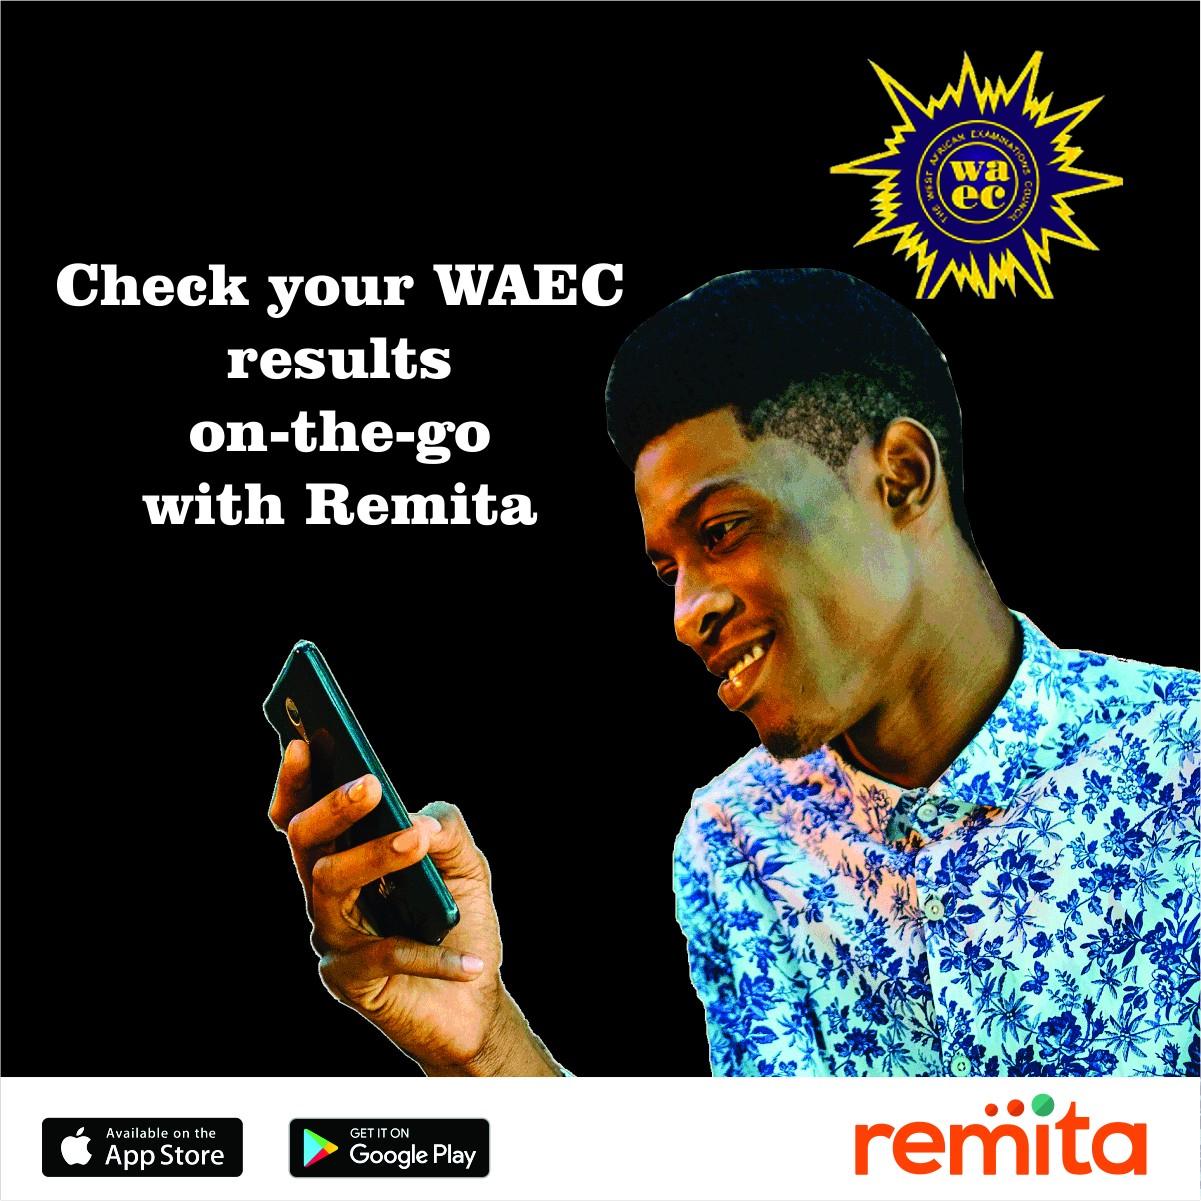 Purchase WAEC Result Checker e-Pin via Remita for (₦900) Only